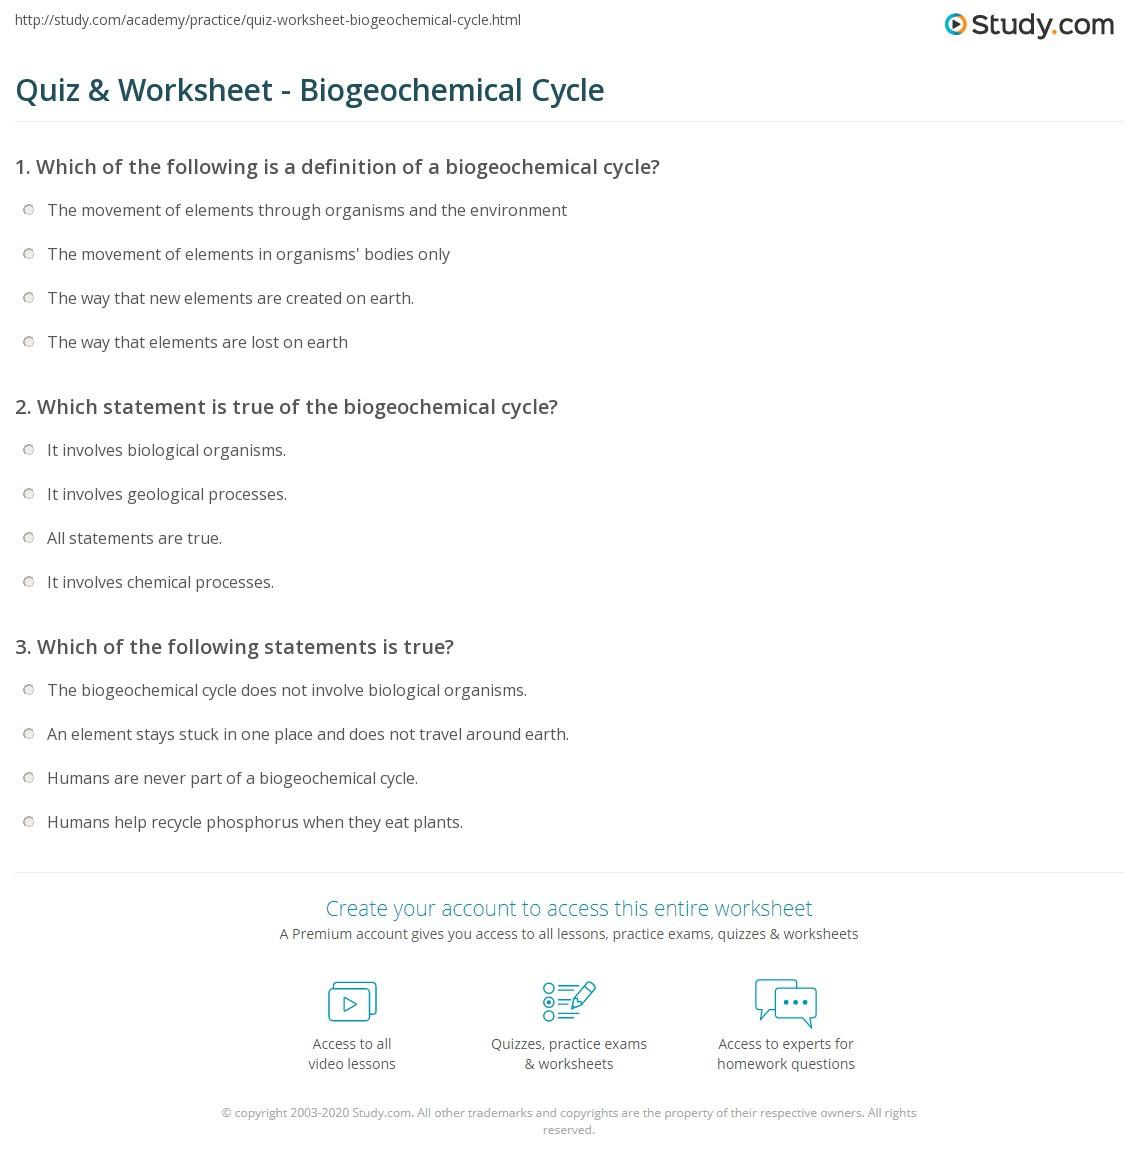 Quiz & Worksheet Biogeochemical Cycle